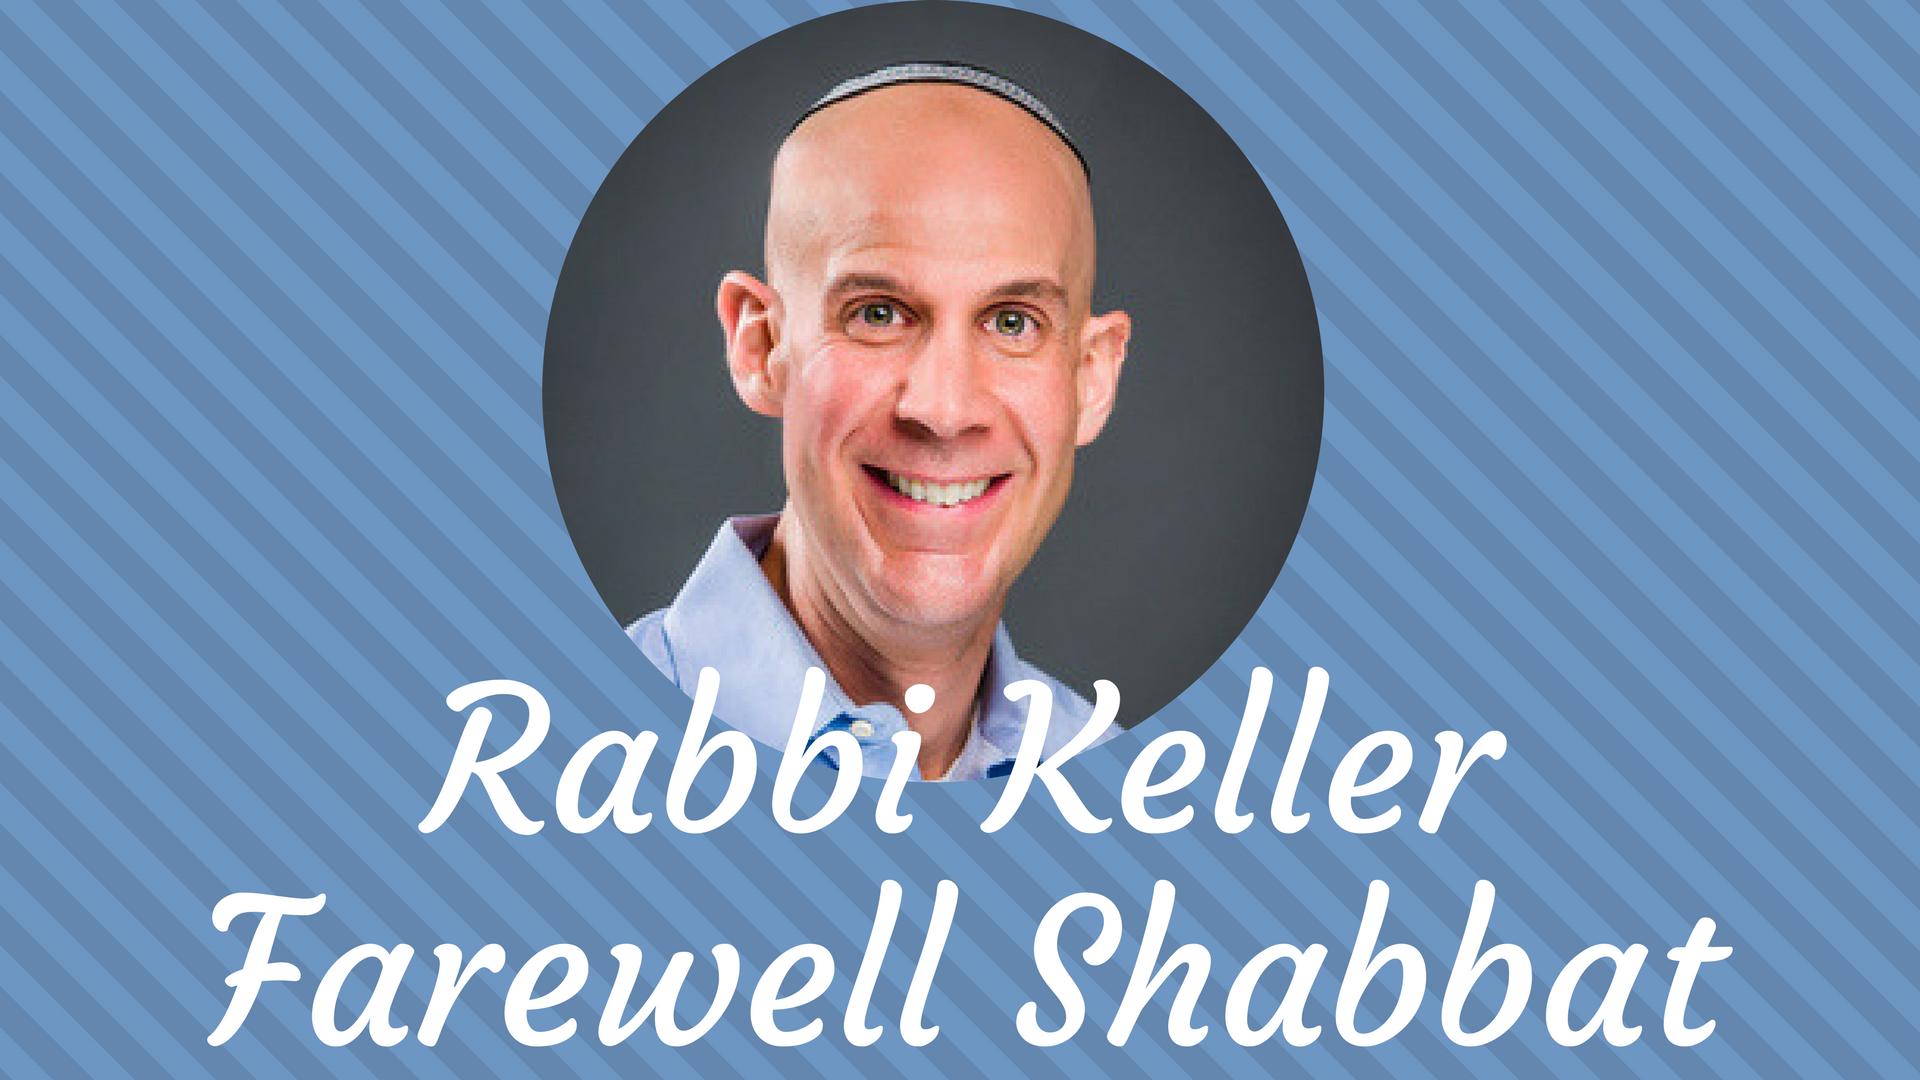 Rabbi Keller Farewell Shabbat Registration